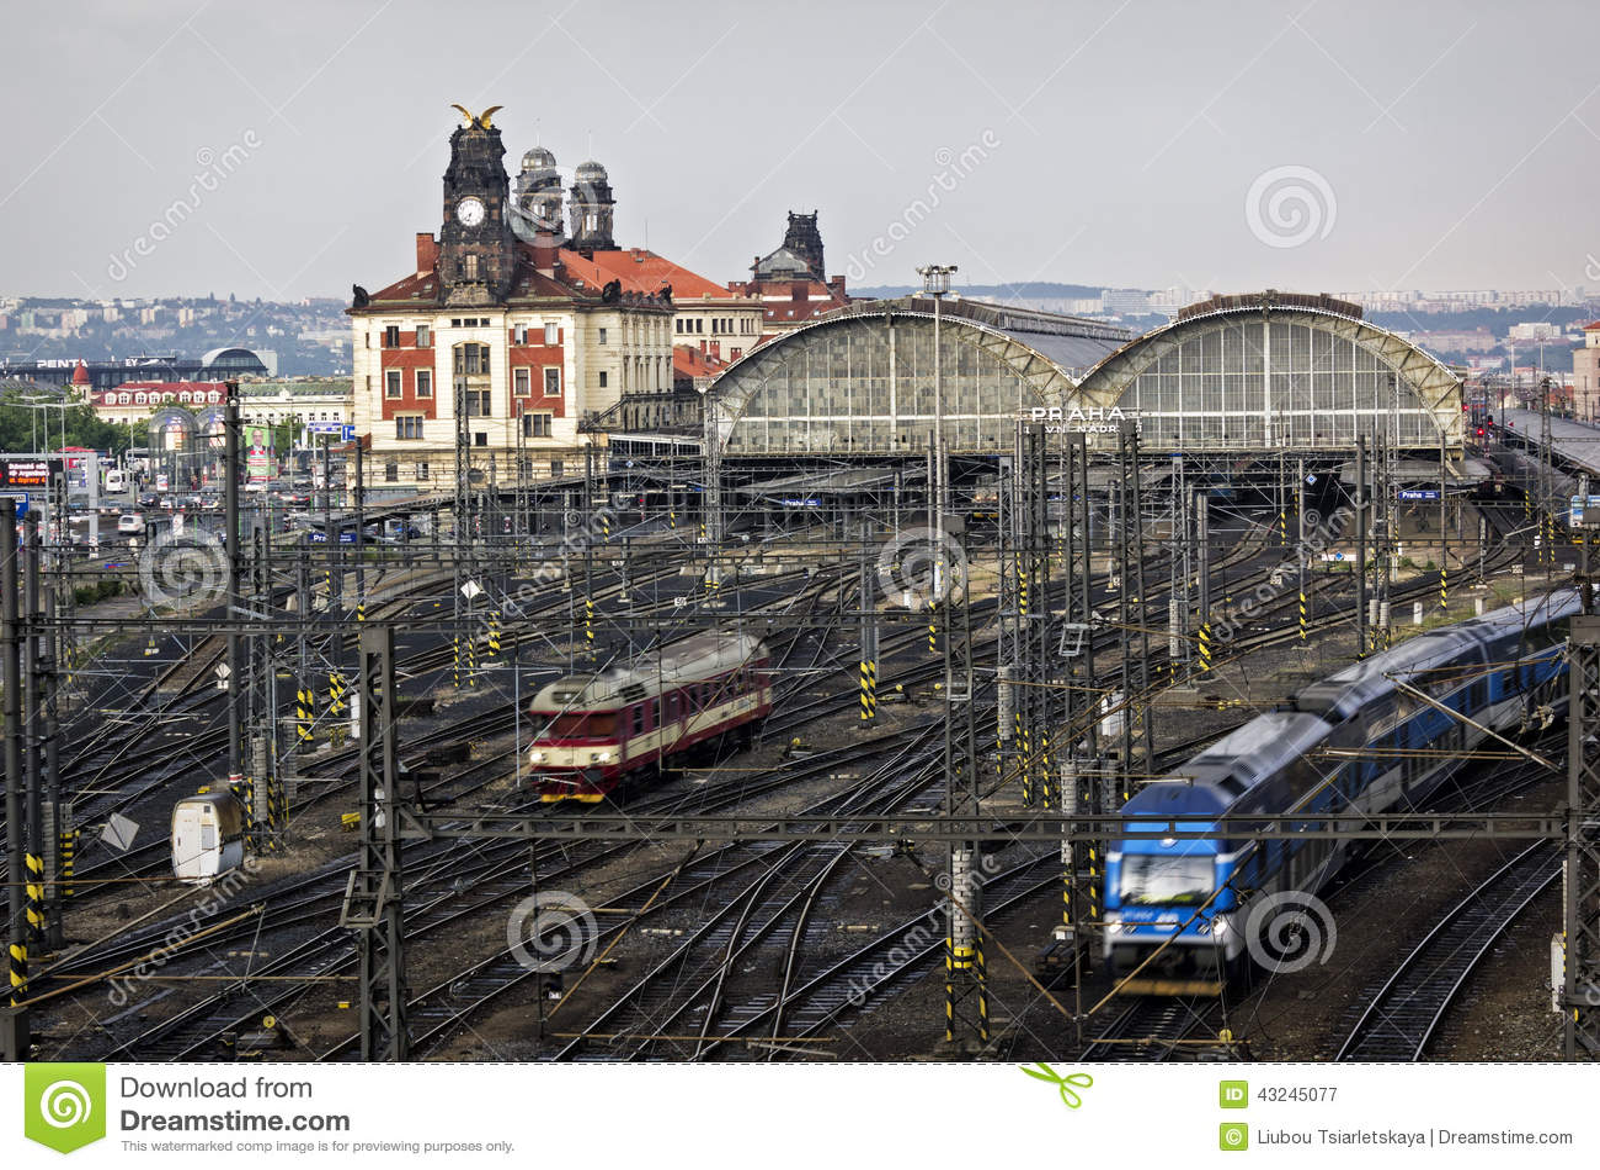 Railway station prague editorial photography image for Designhotel elephant prague 1 czech republic